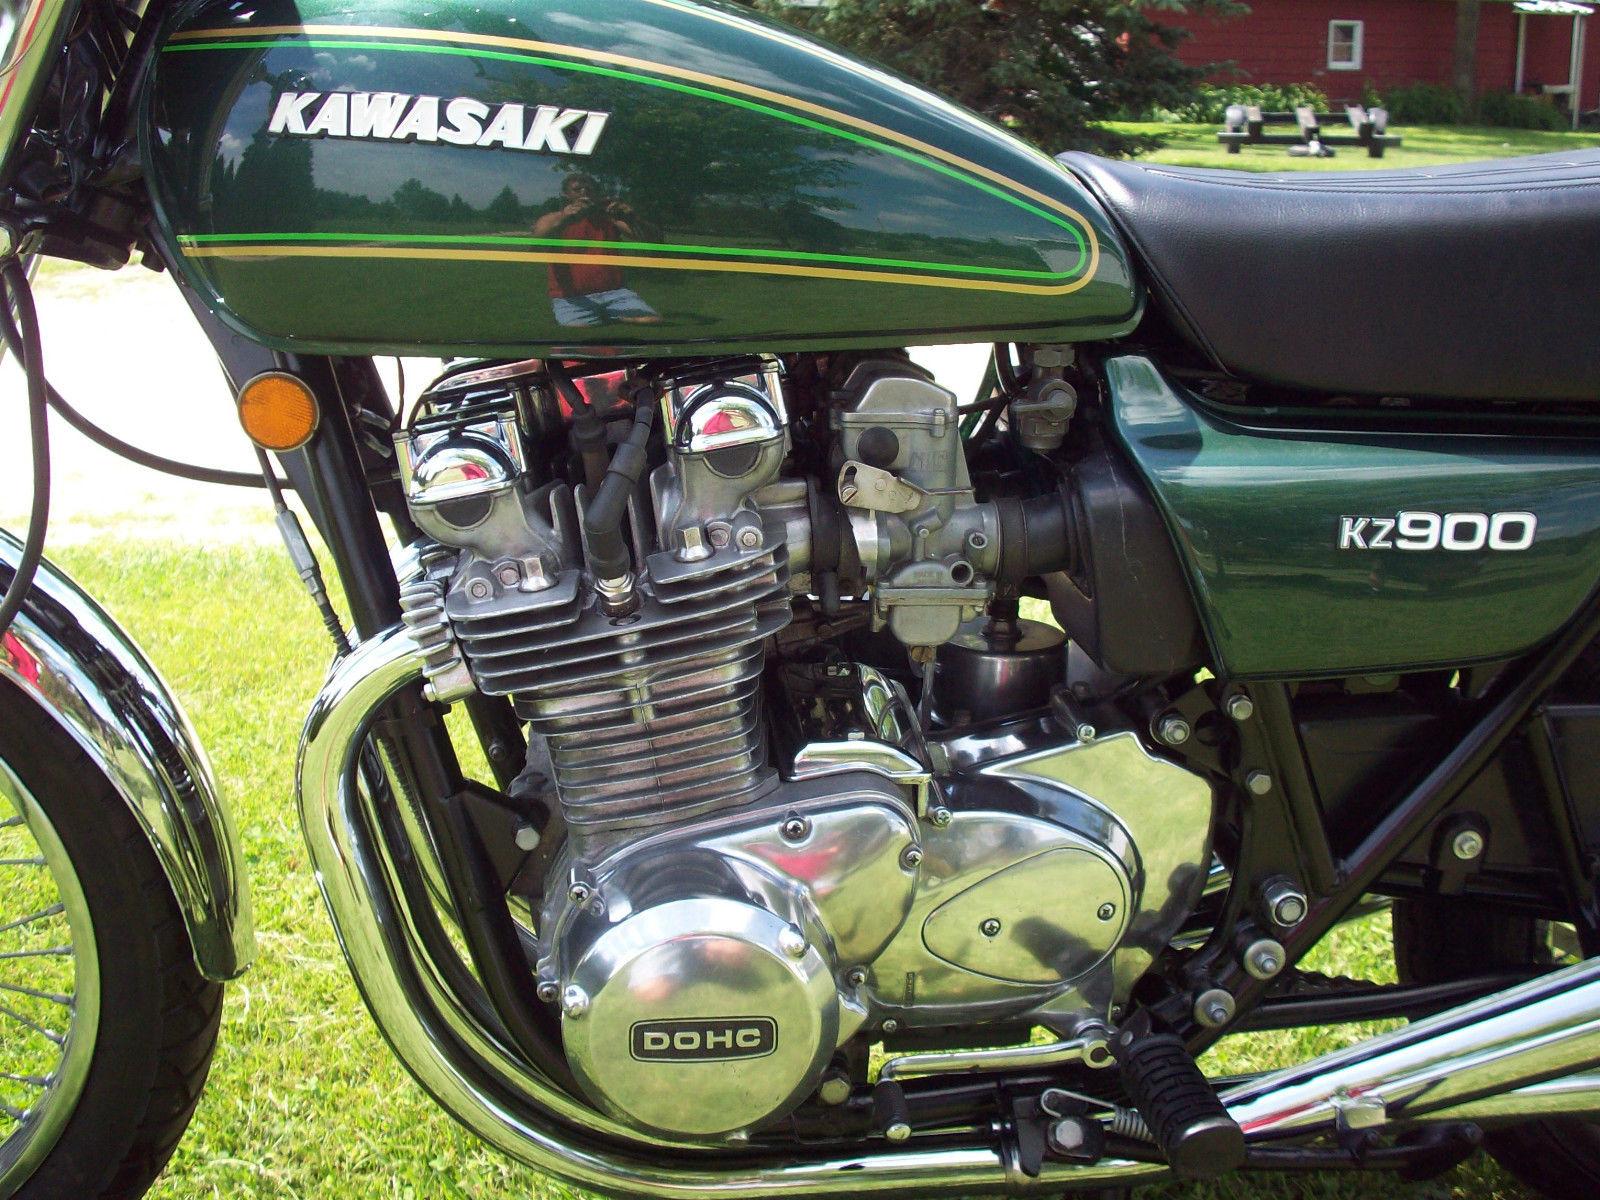 Restored Kawasaki Kz900